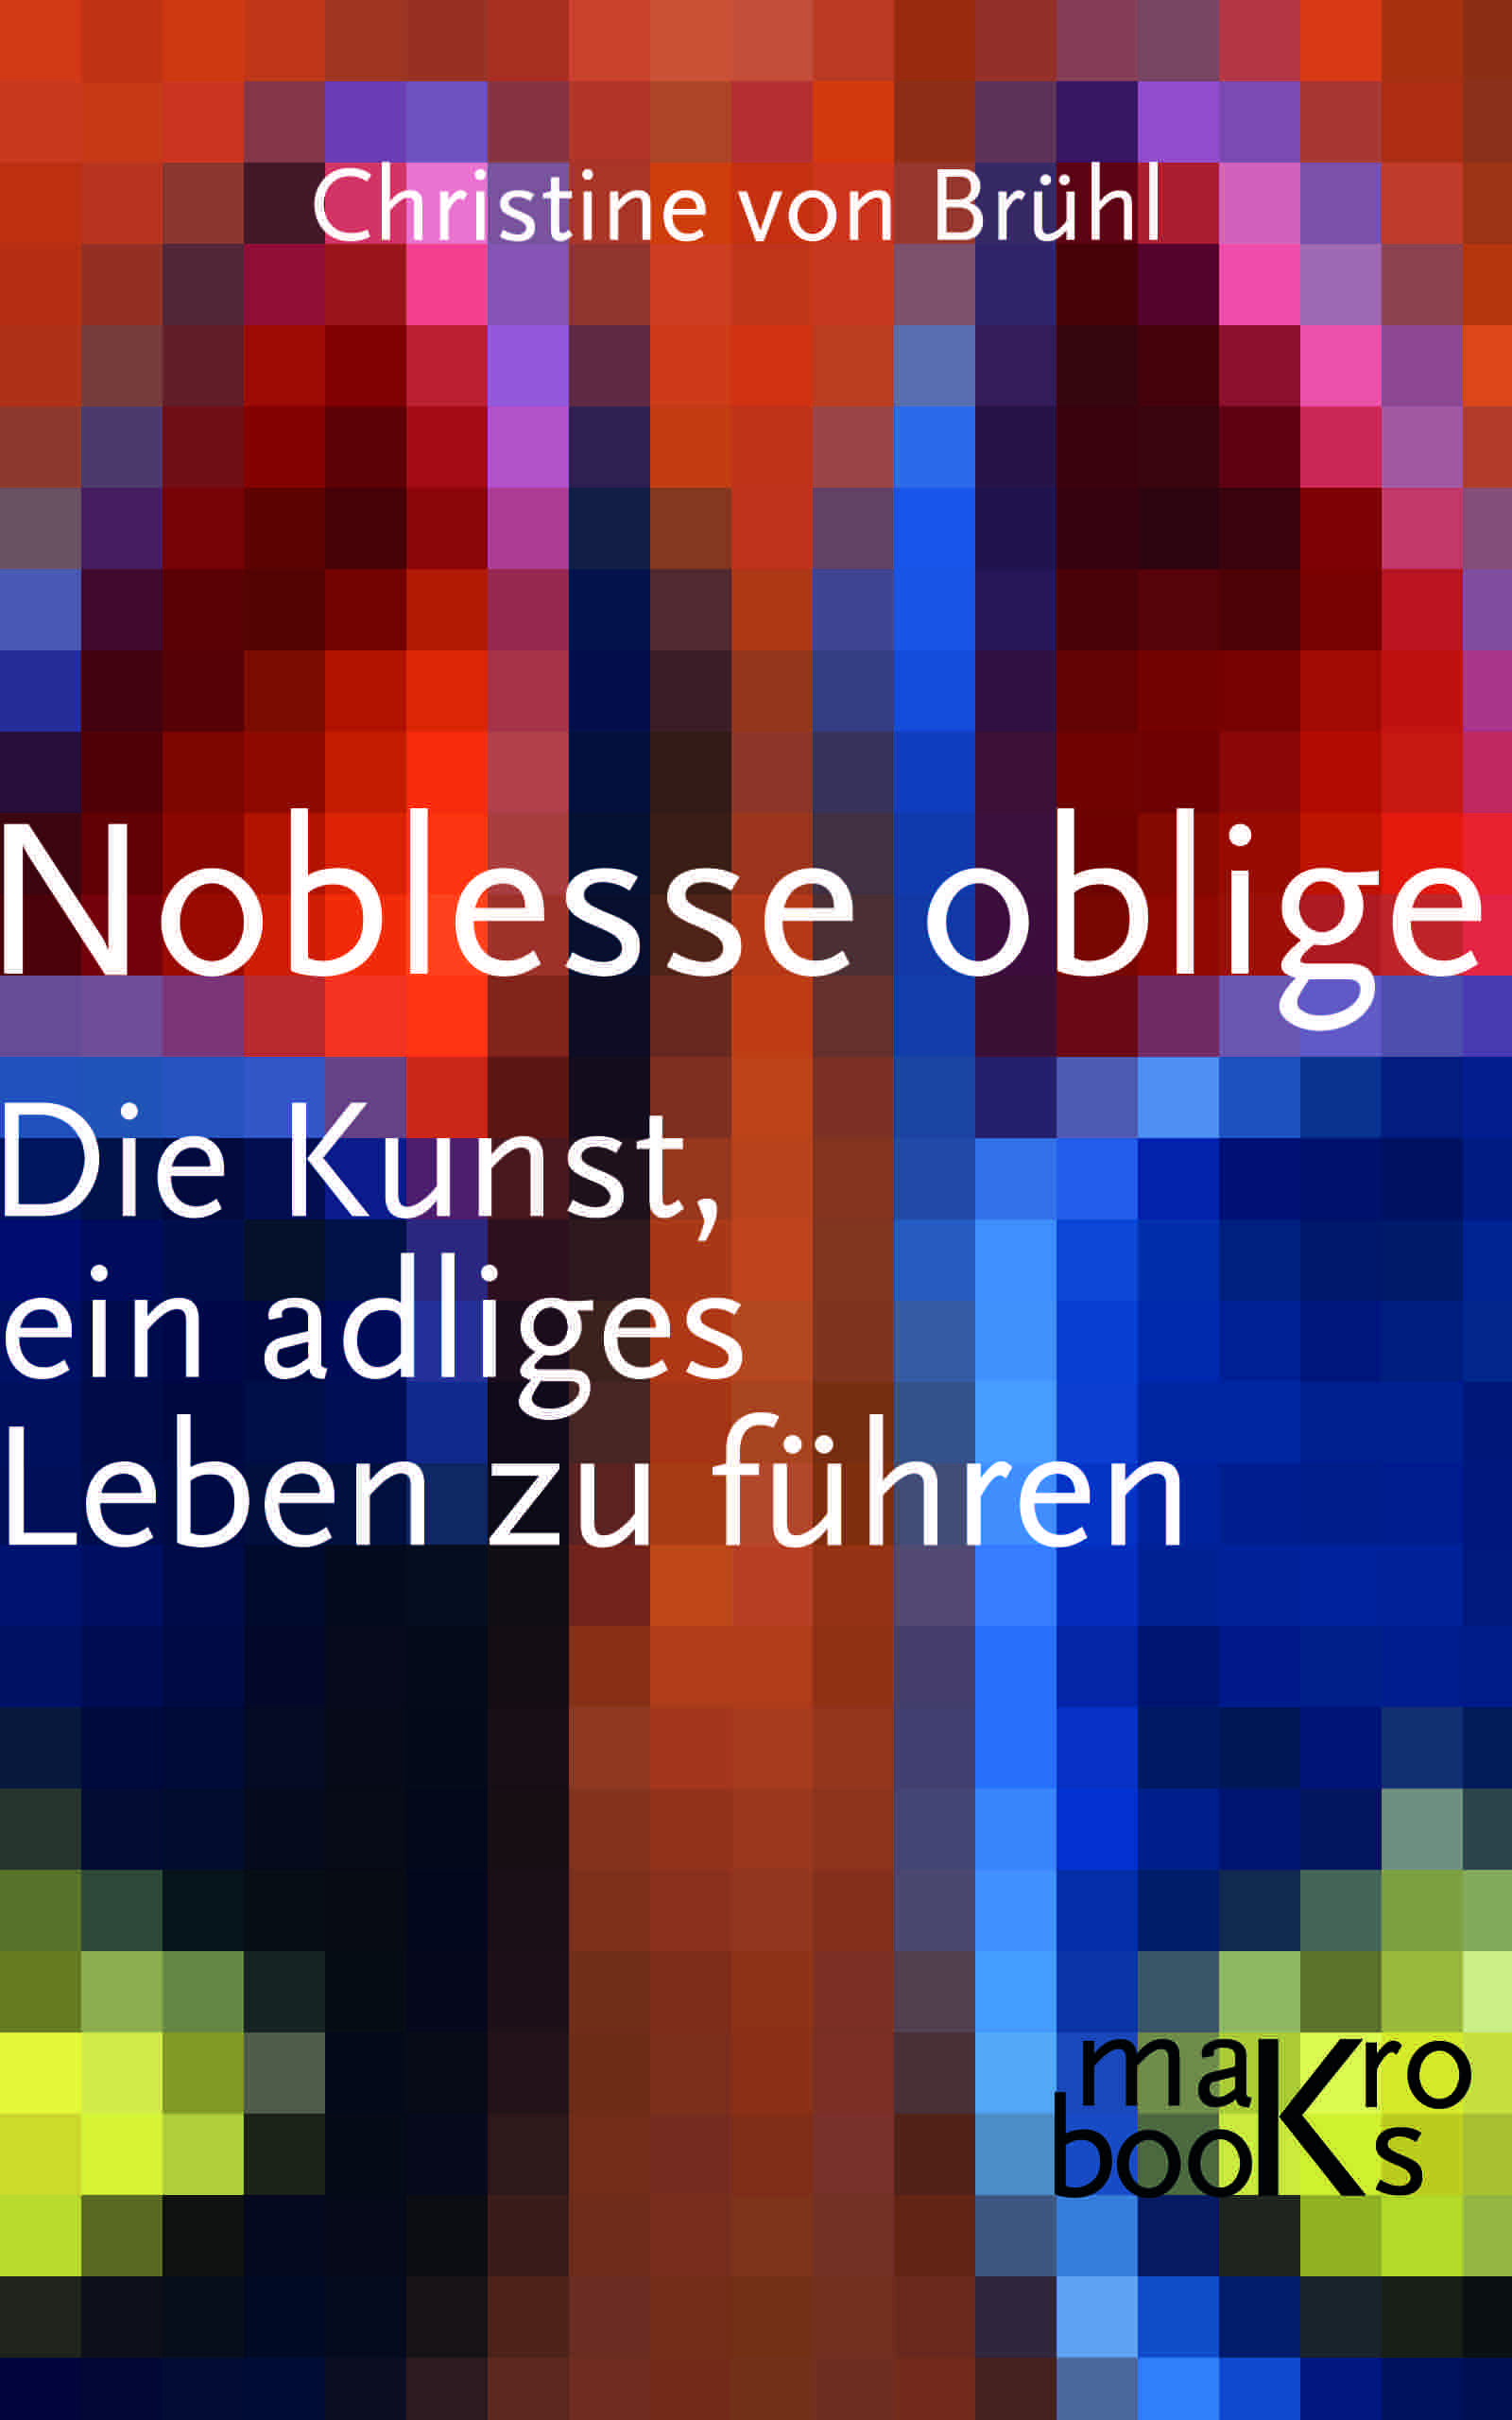 http://www.ebook.de/de/product/24141788/christine_bruehl_noblesse_oblige.html?searchId=275415837